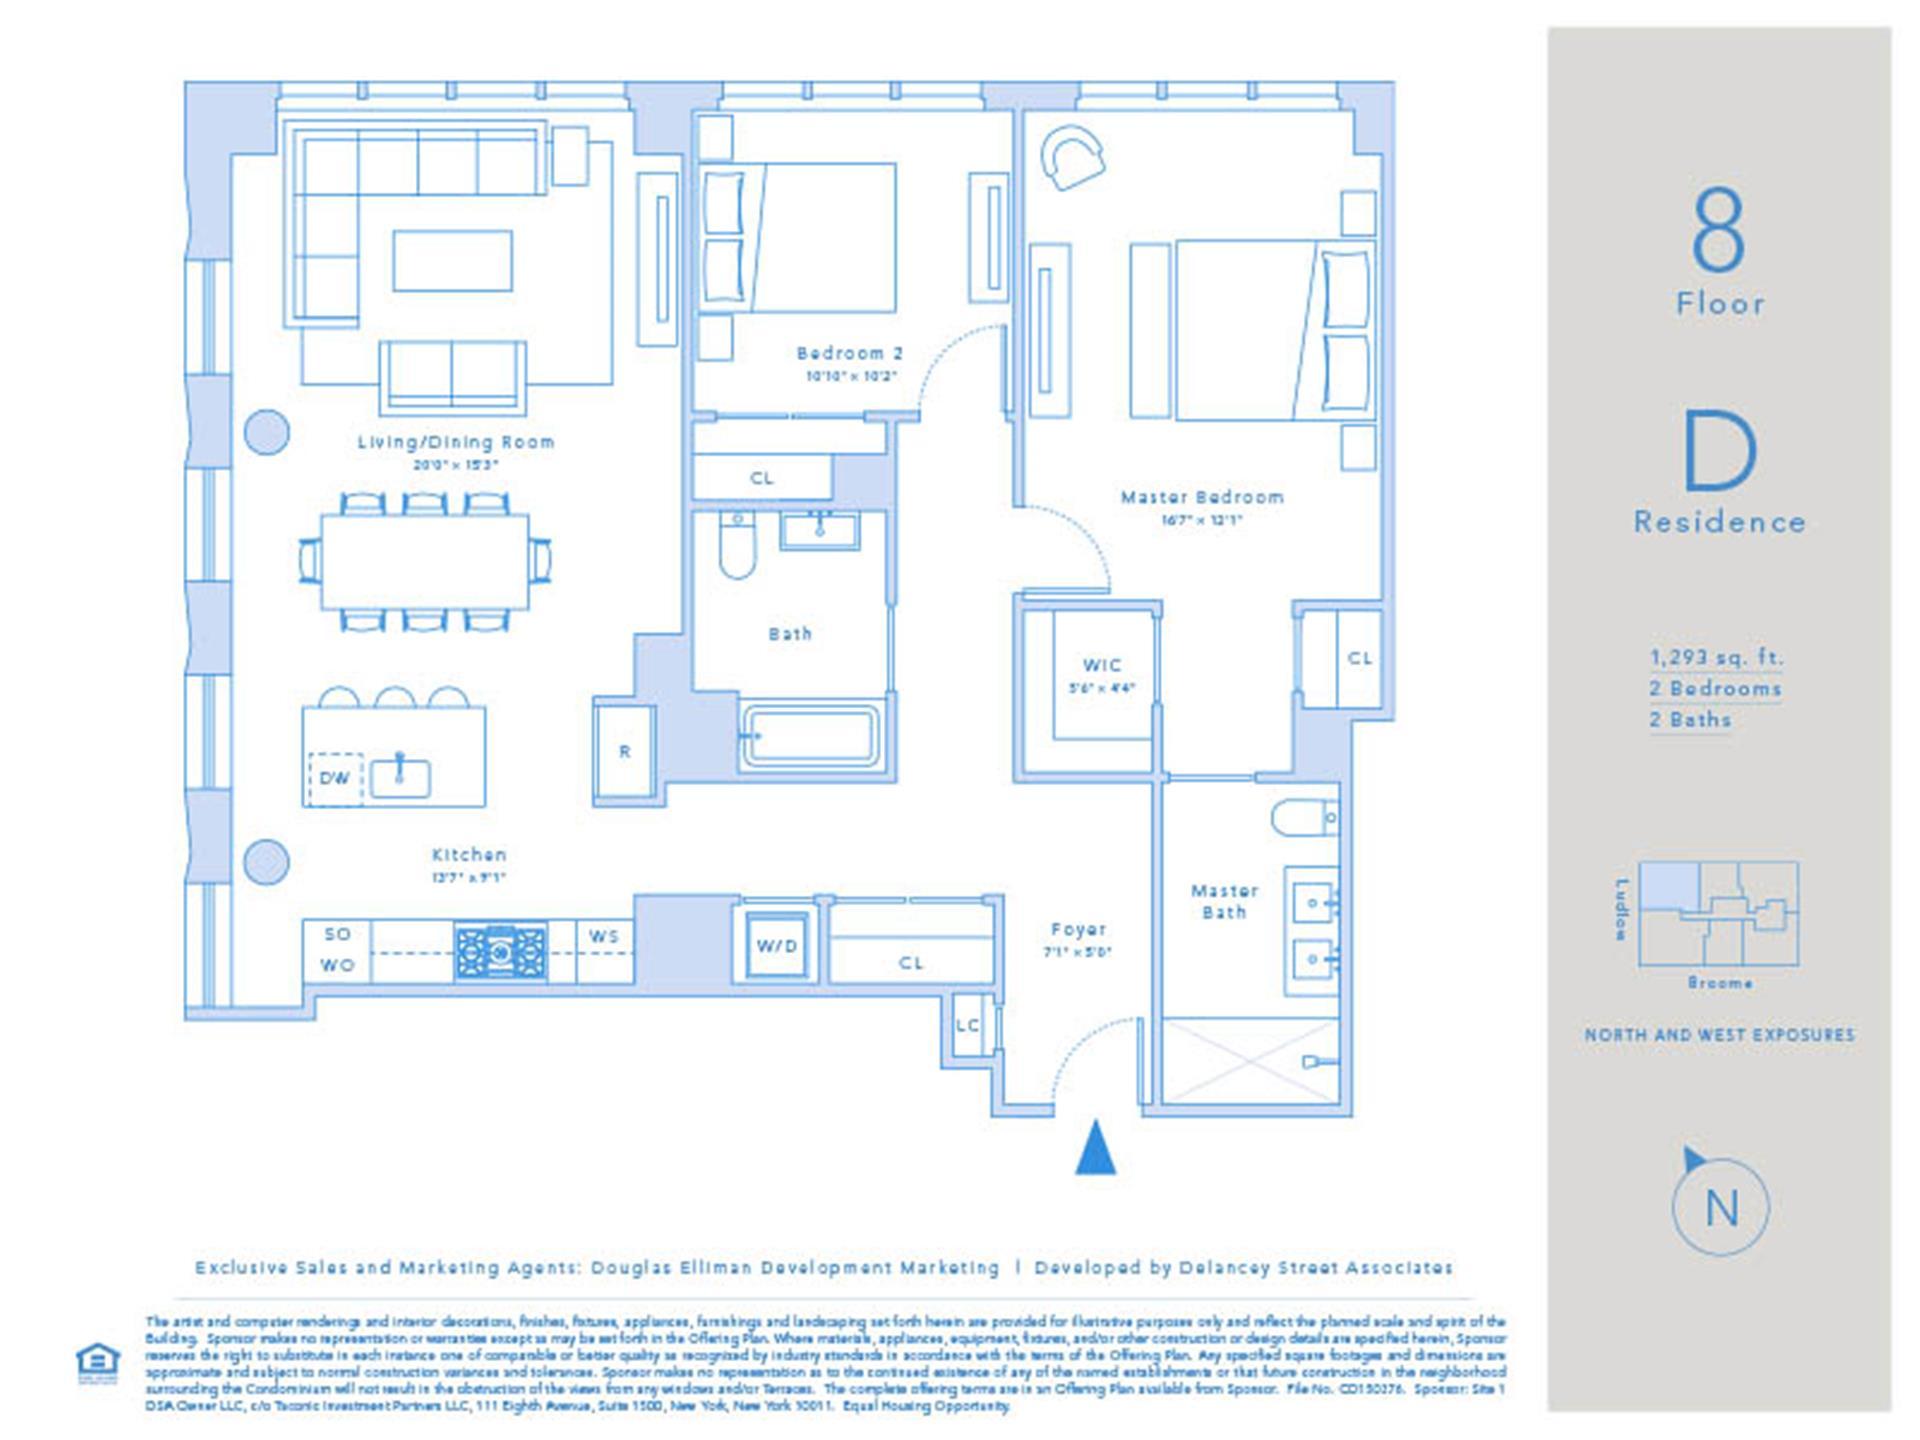 Floor plan of Essex Crossing, 242 Broome St, 8D - Lower East Side, New York